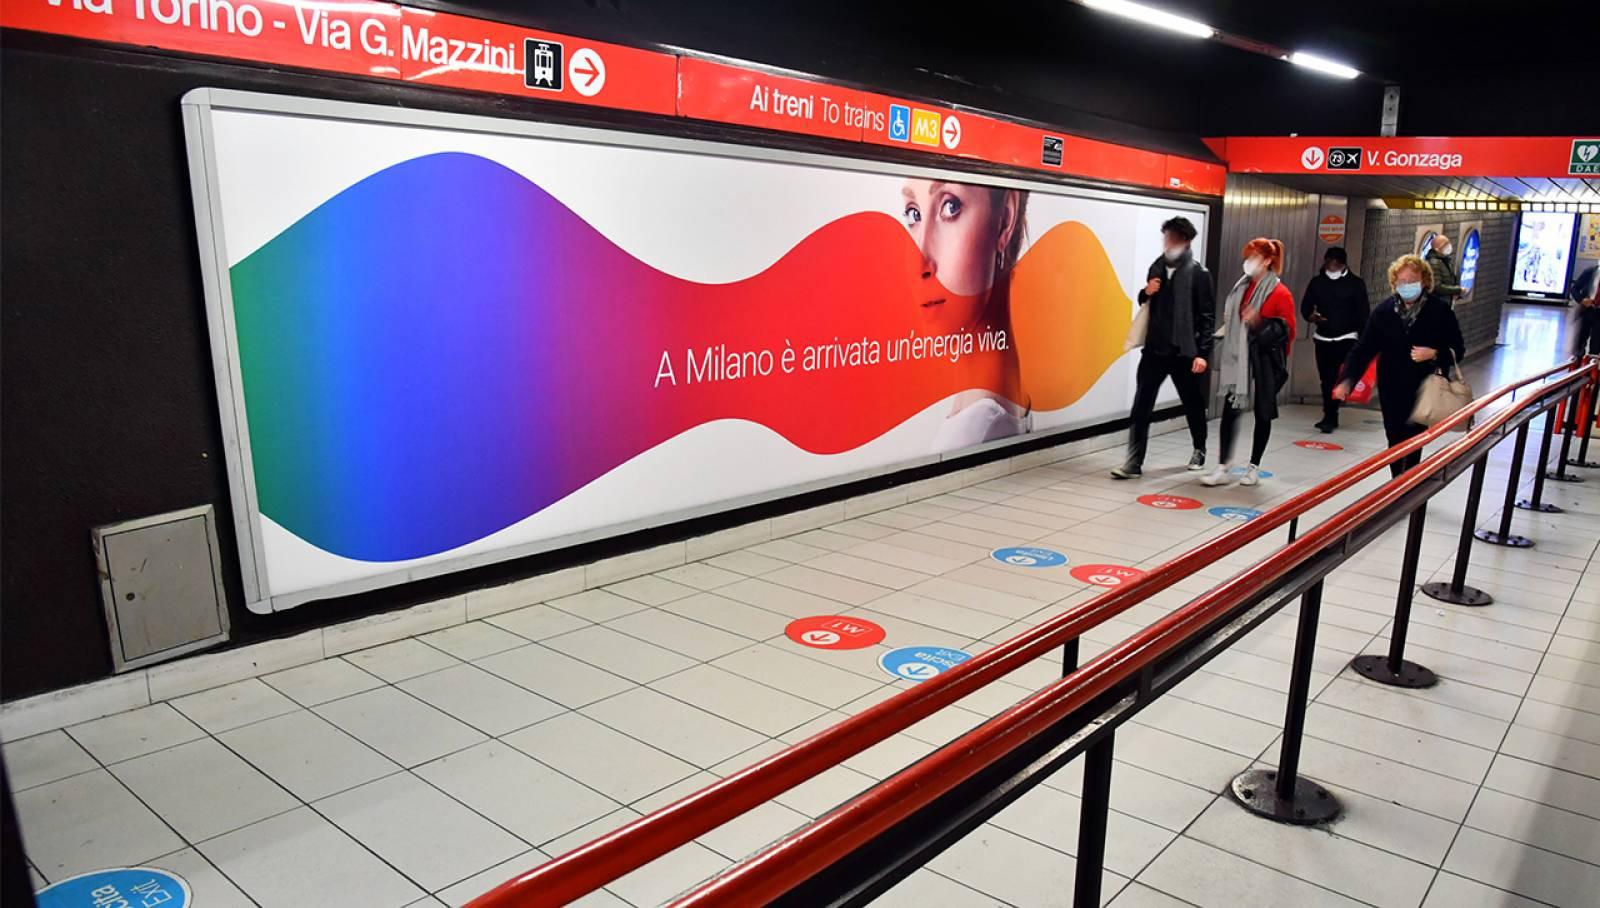 Pubblicità metro milanese IGPDecaux Station Domination per Iren